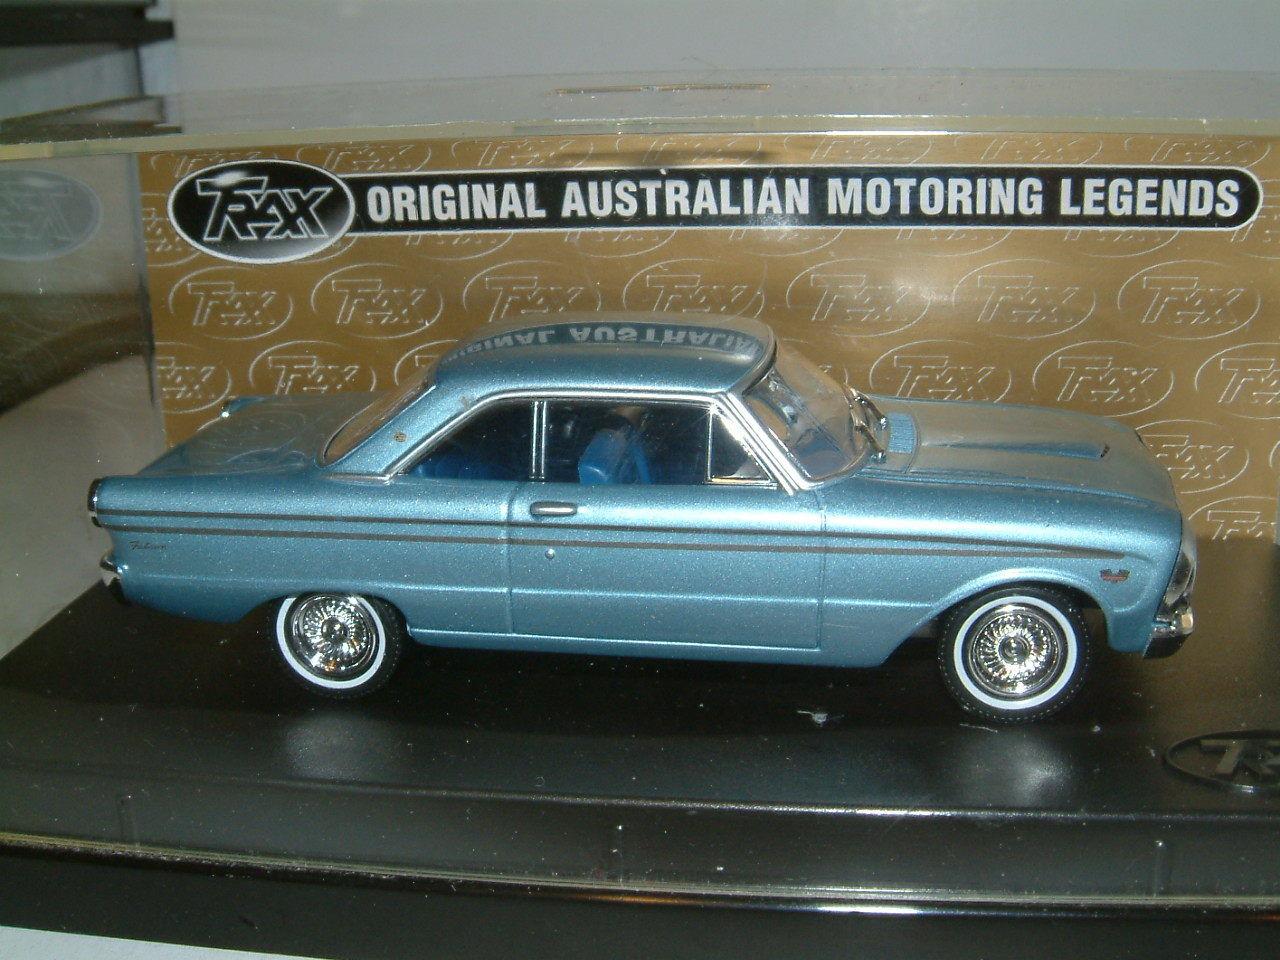 1 43 Trax FORD 1964 XM Falcon Futura Hardtop dans Bleu clair atteint. Australie TG